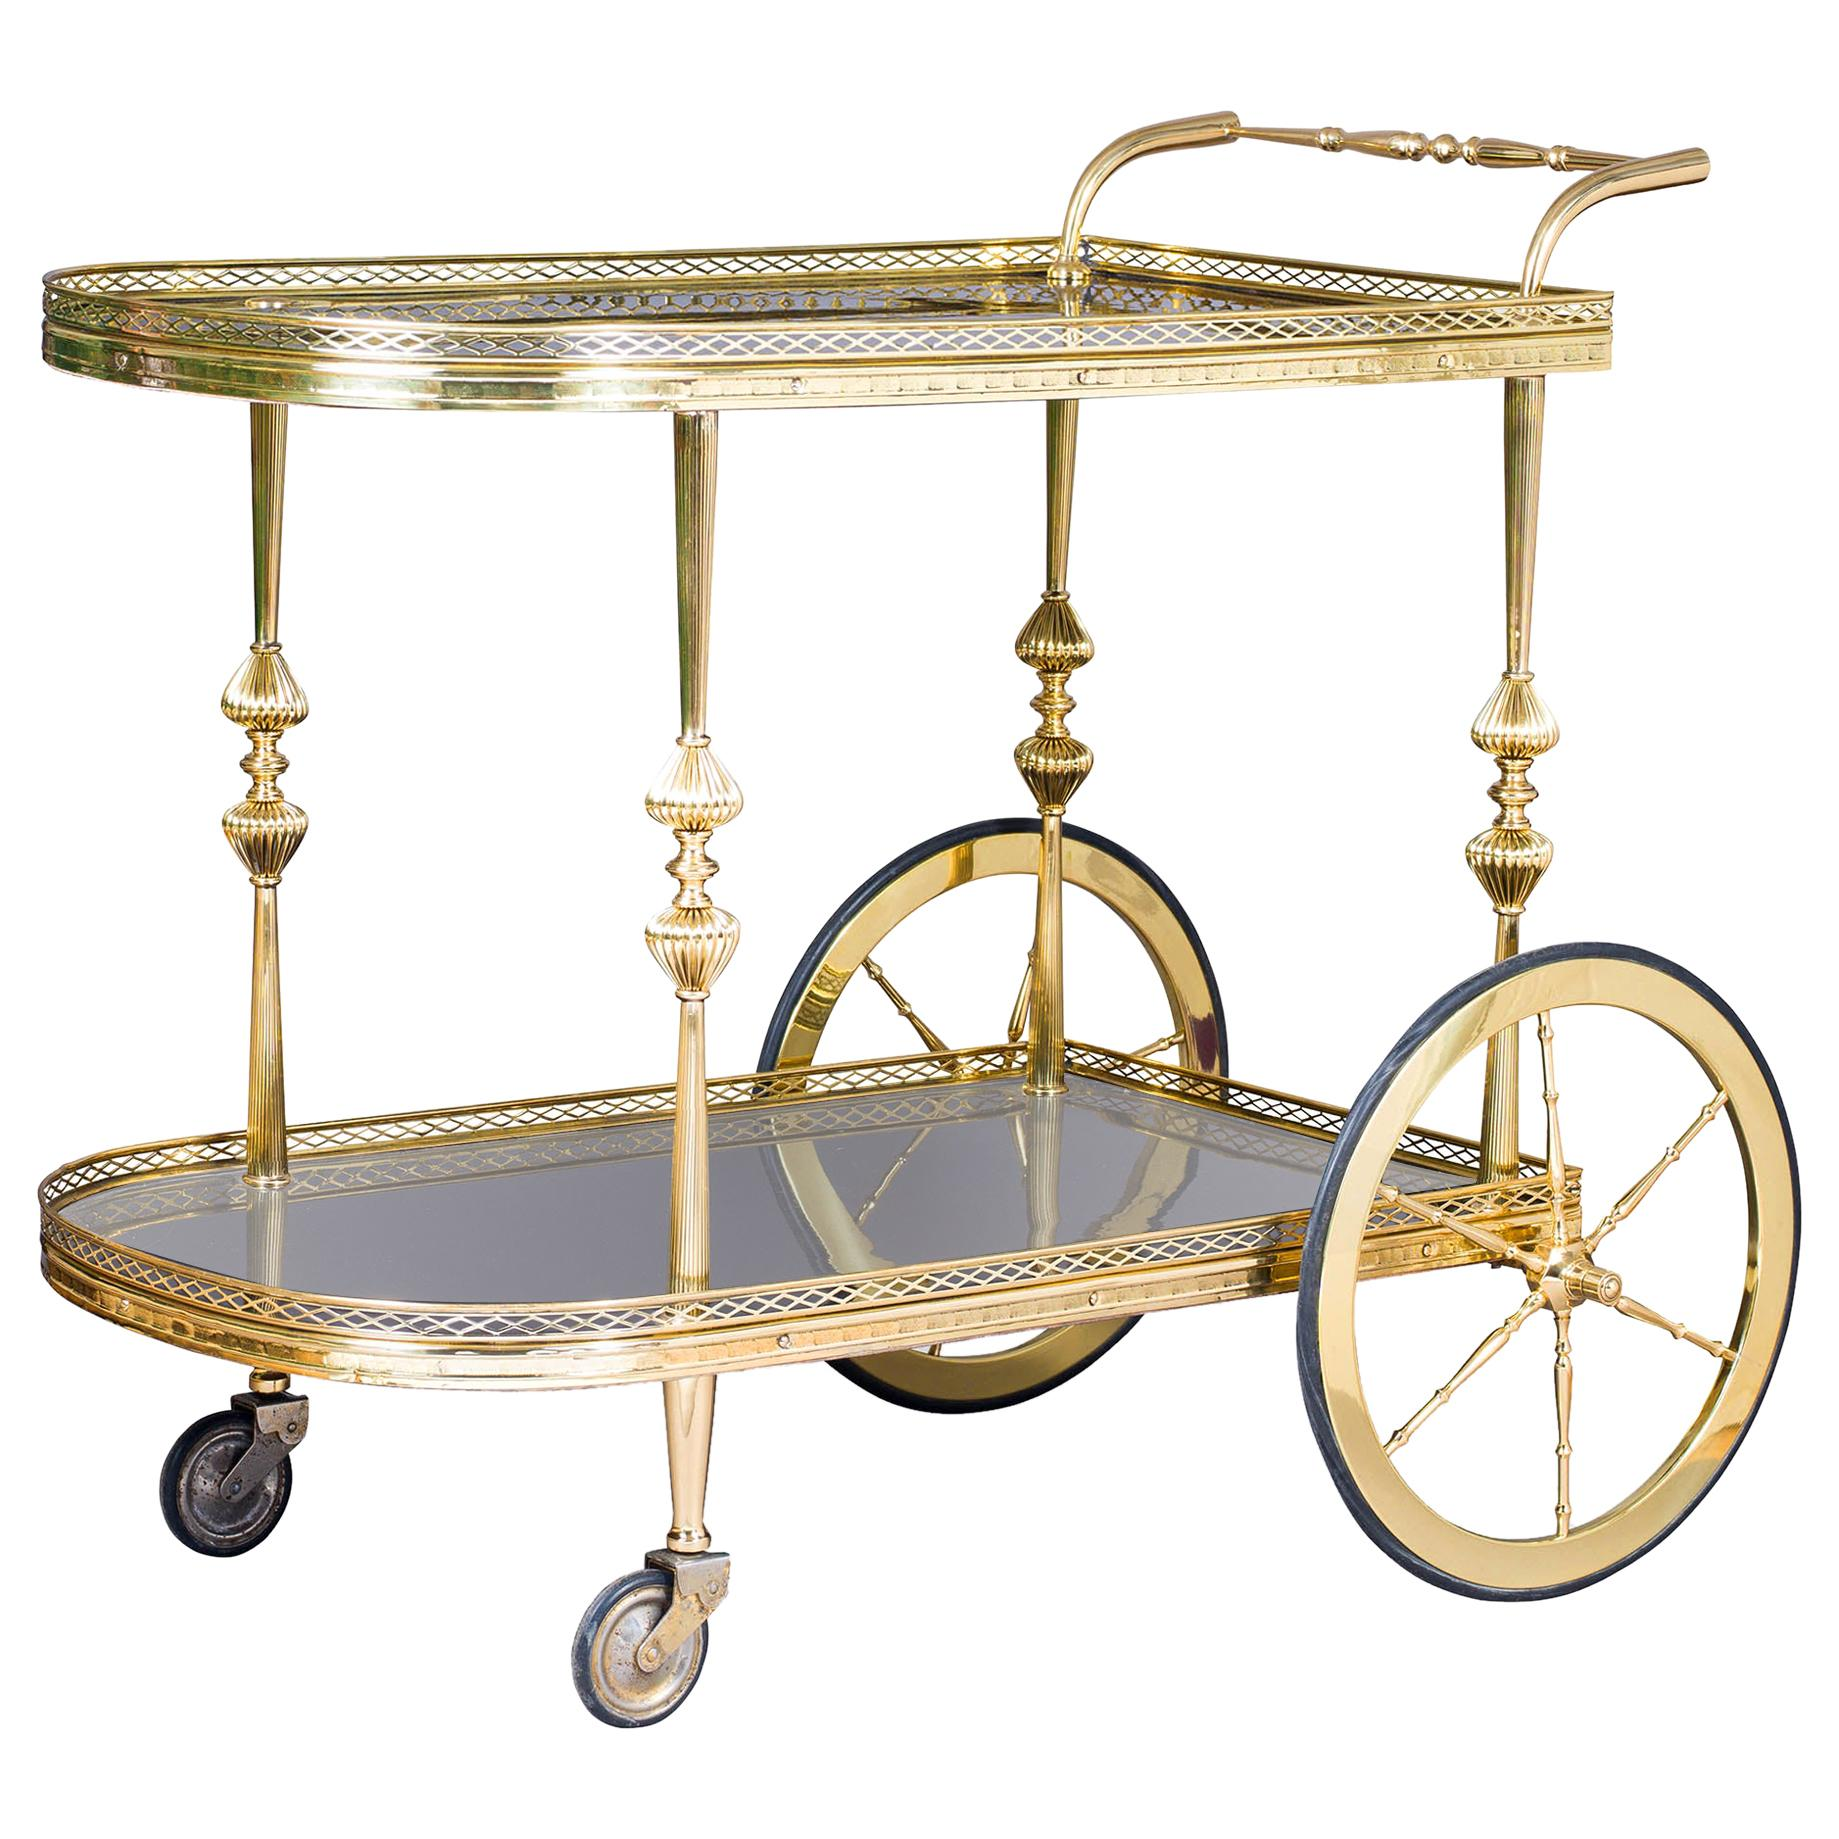 Fine Mid-Century Drinks Trolley or Bar Cart